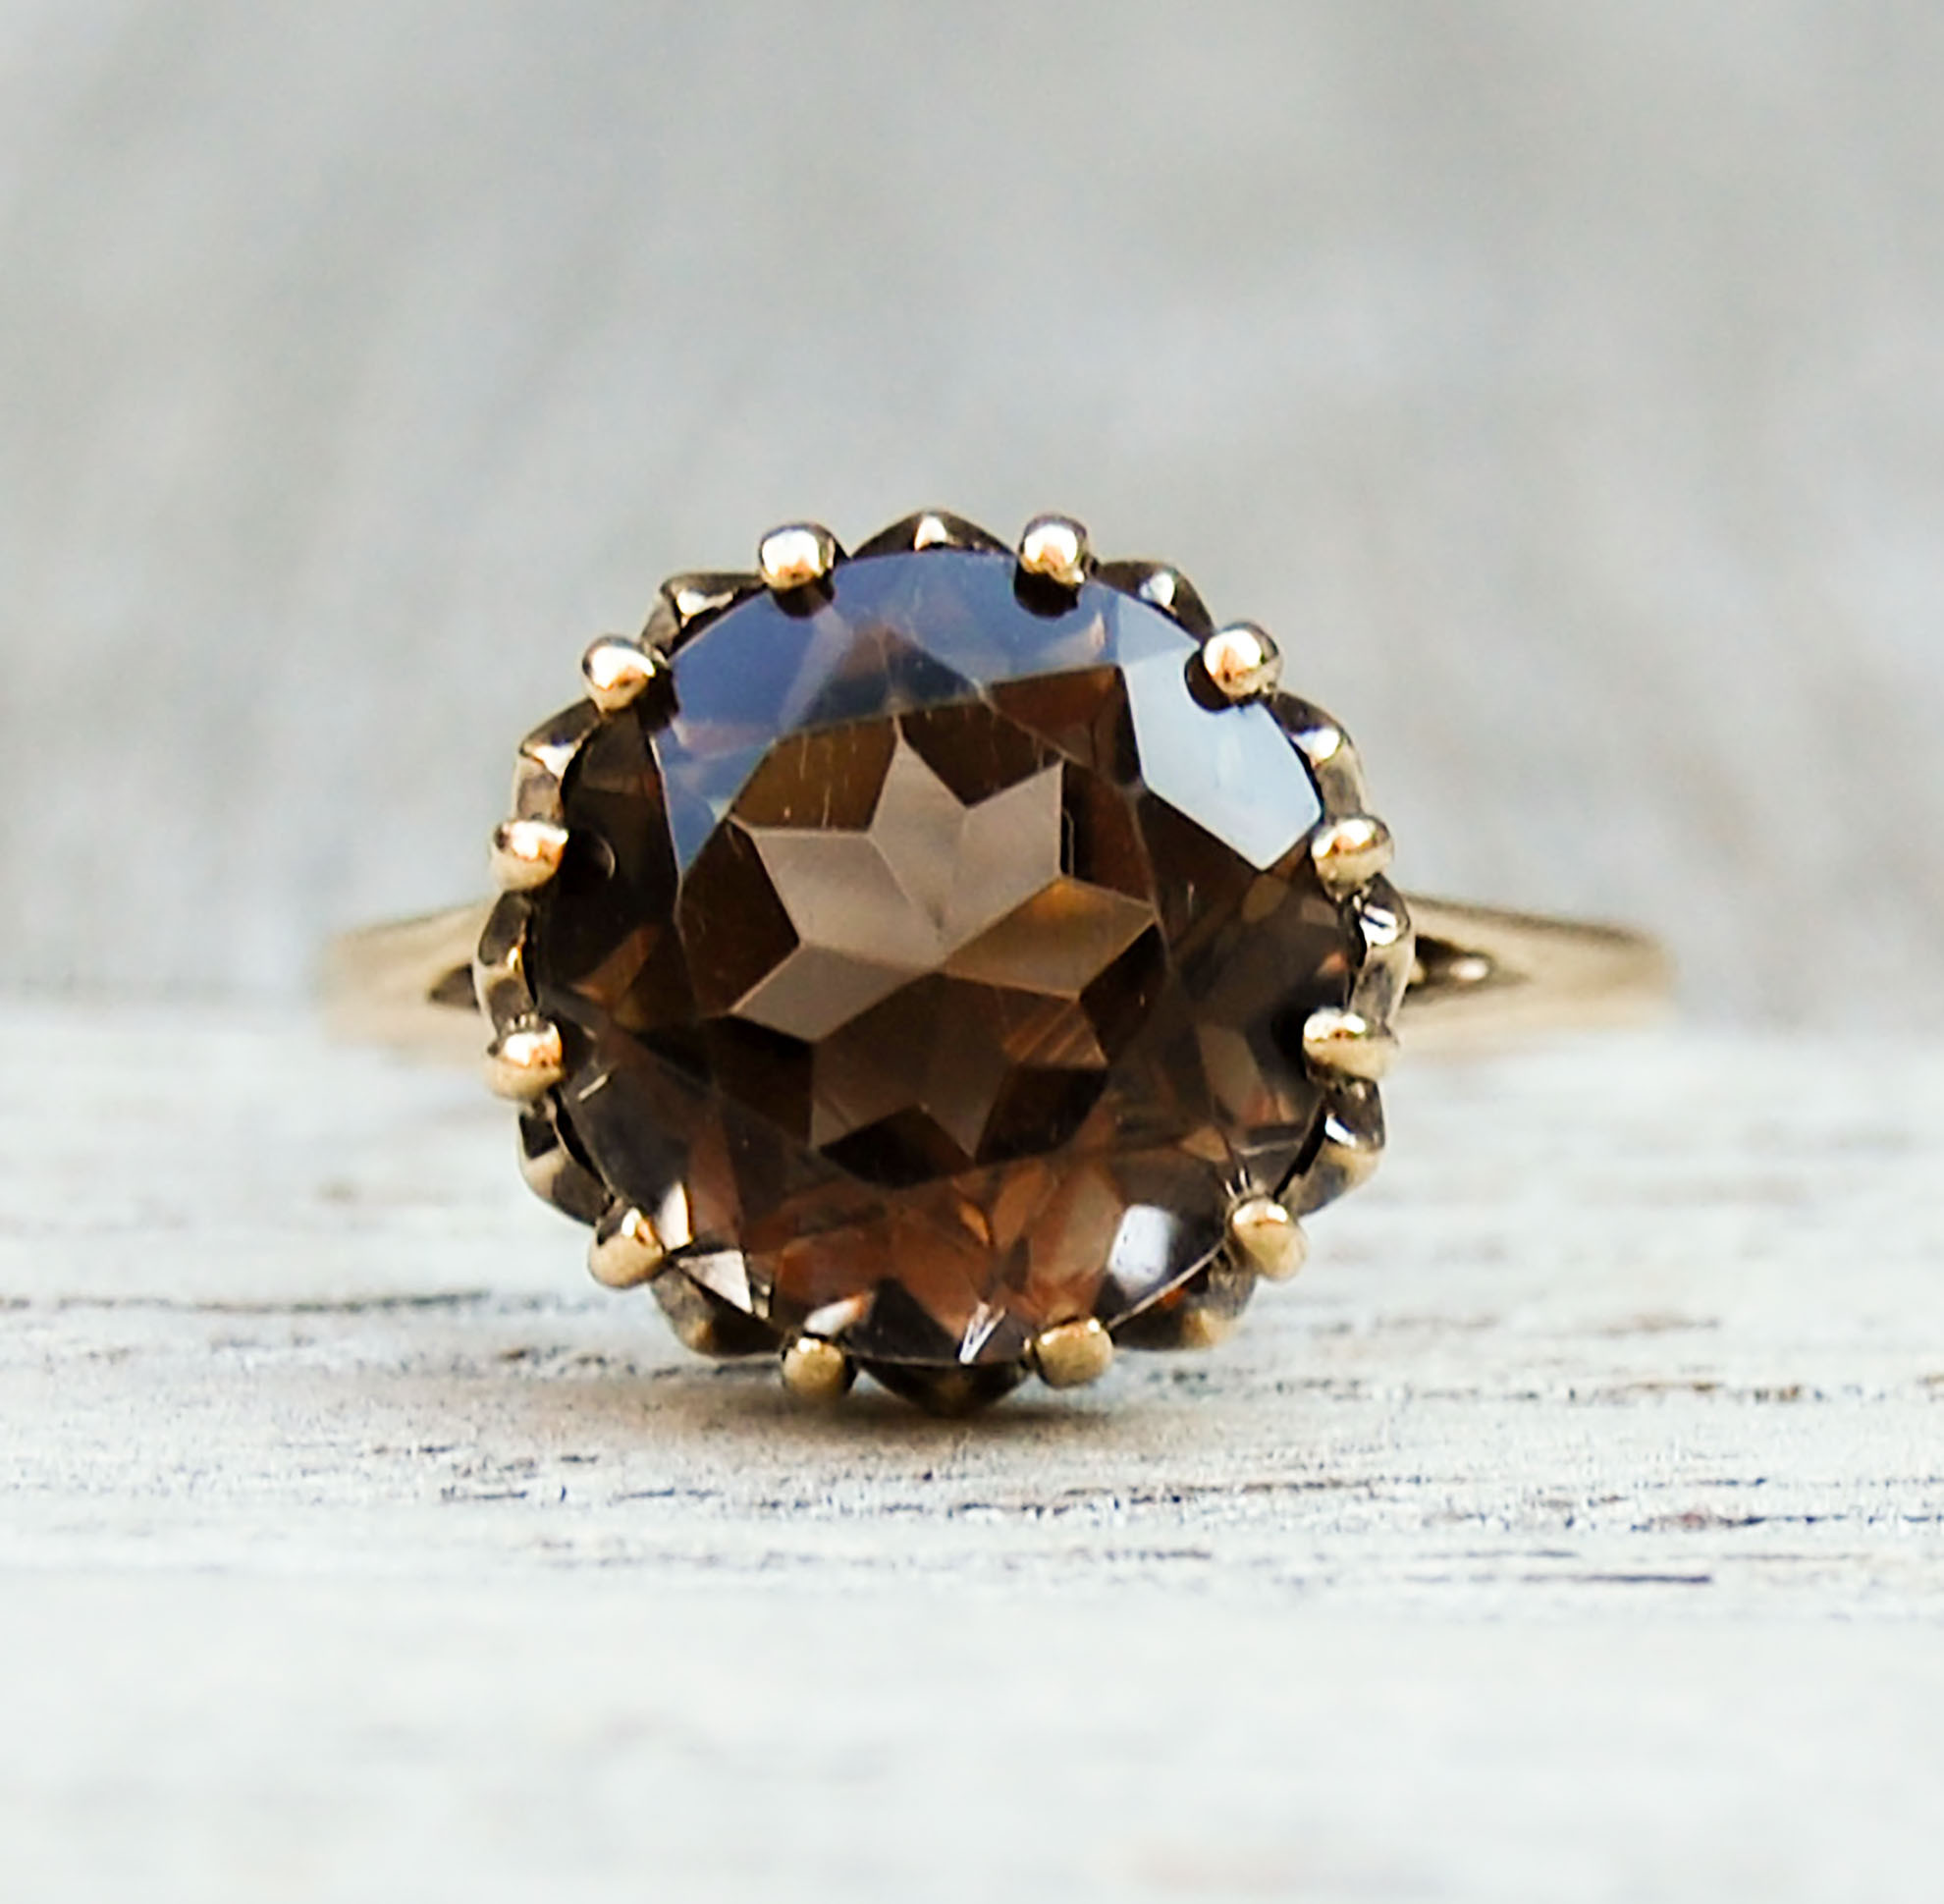 Vintage Cairngorm Quartz/Smoky Topaz Solitaire on Intricate Gold Ring